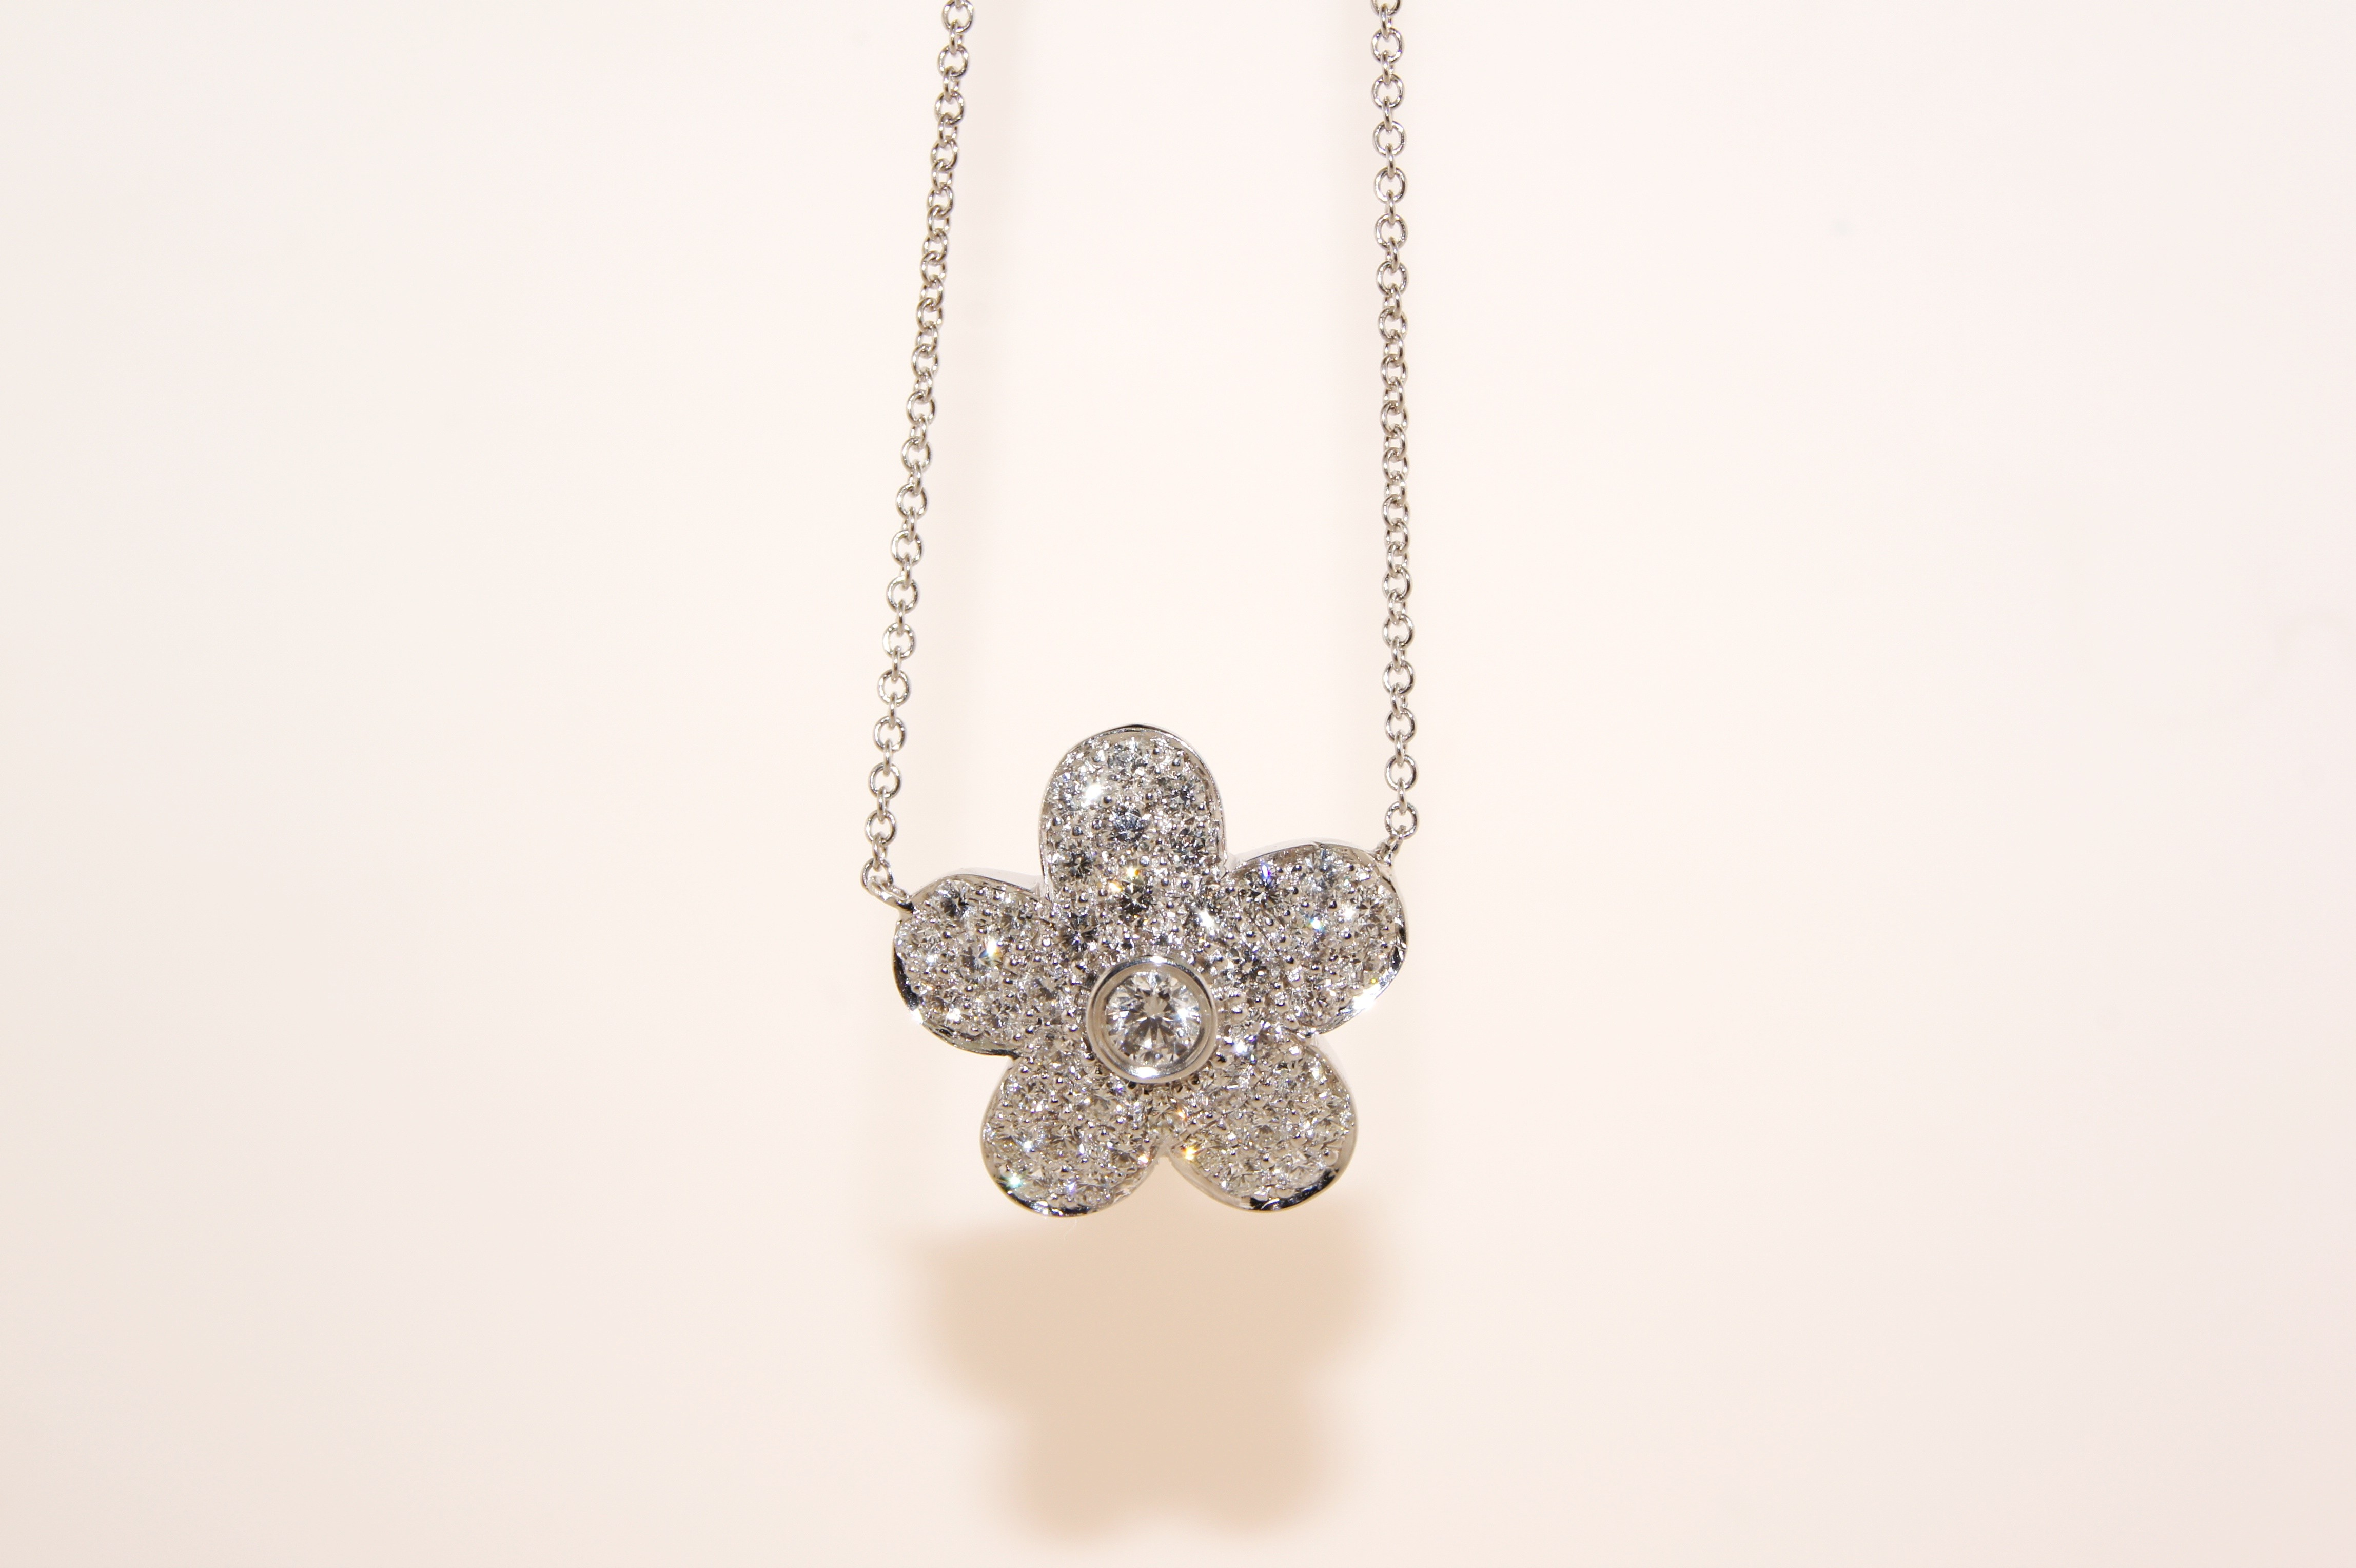 18 karat white gold diamond flower necklace.